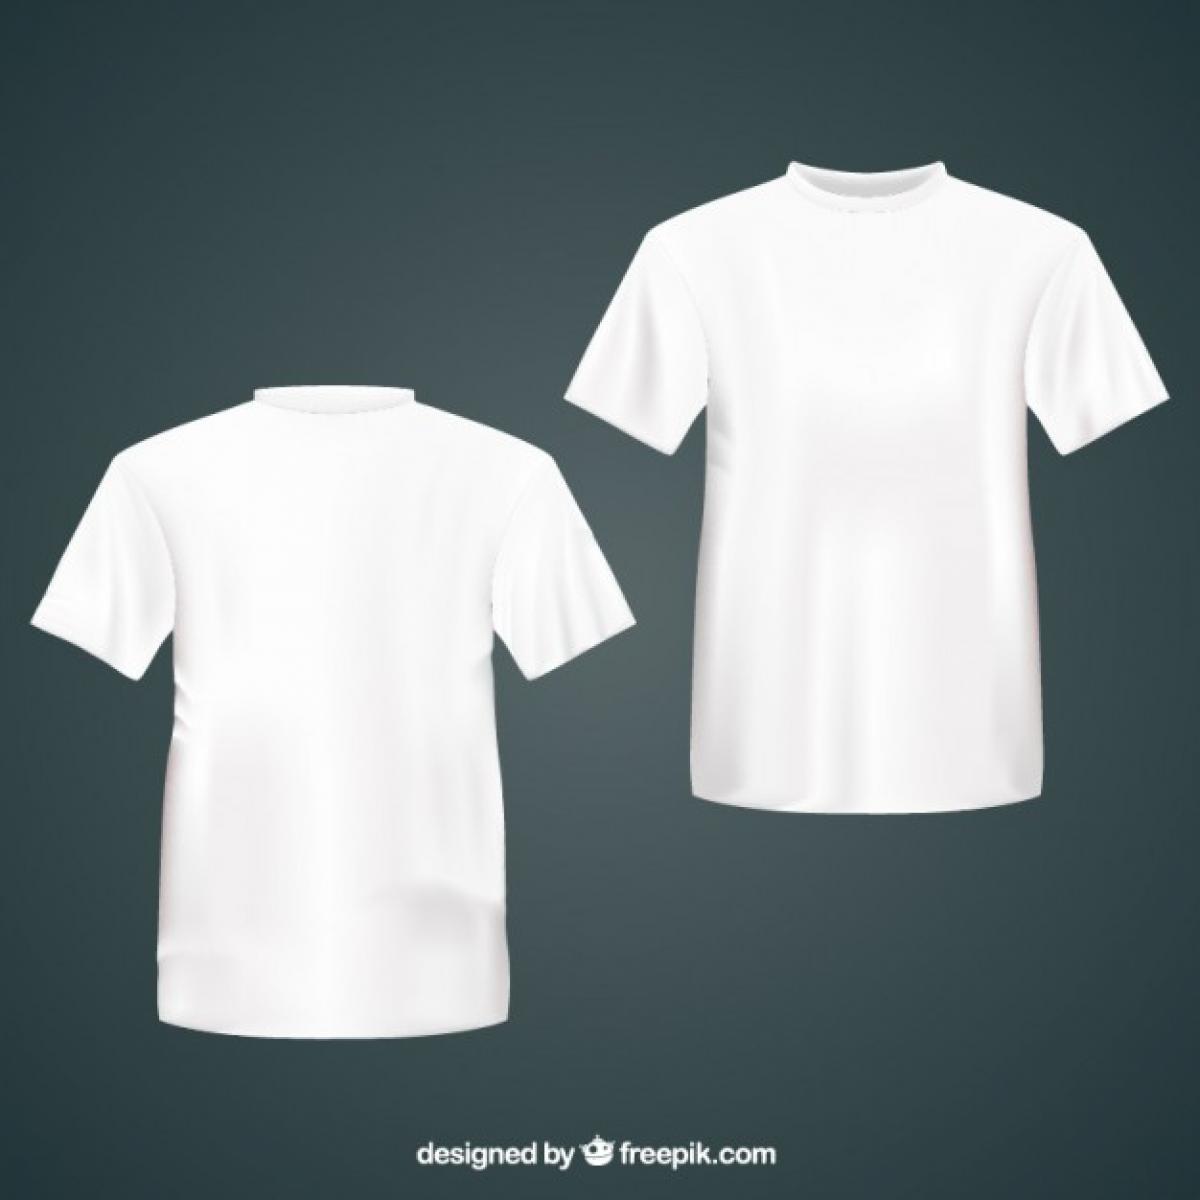 Top T-shirt Clothing